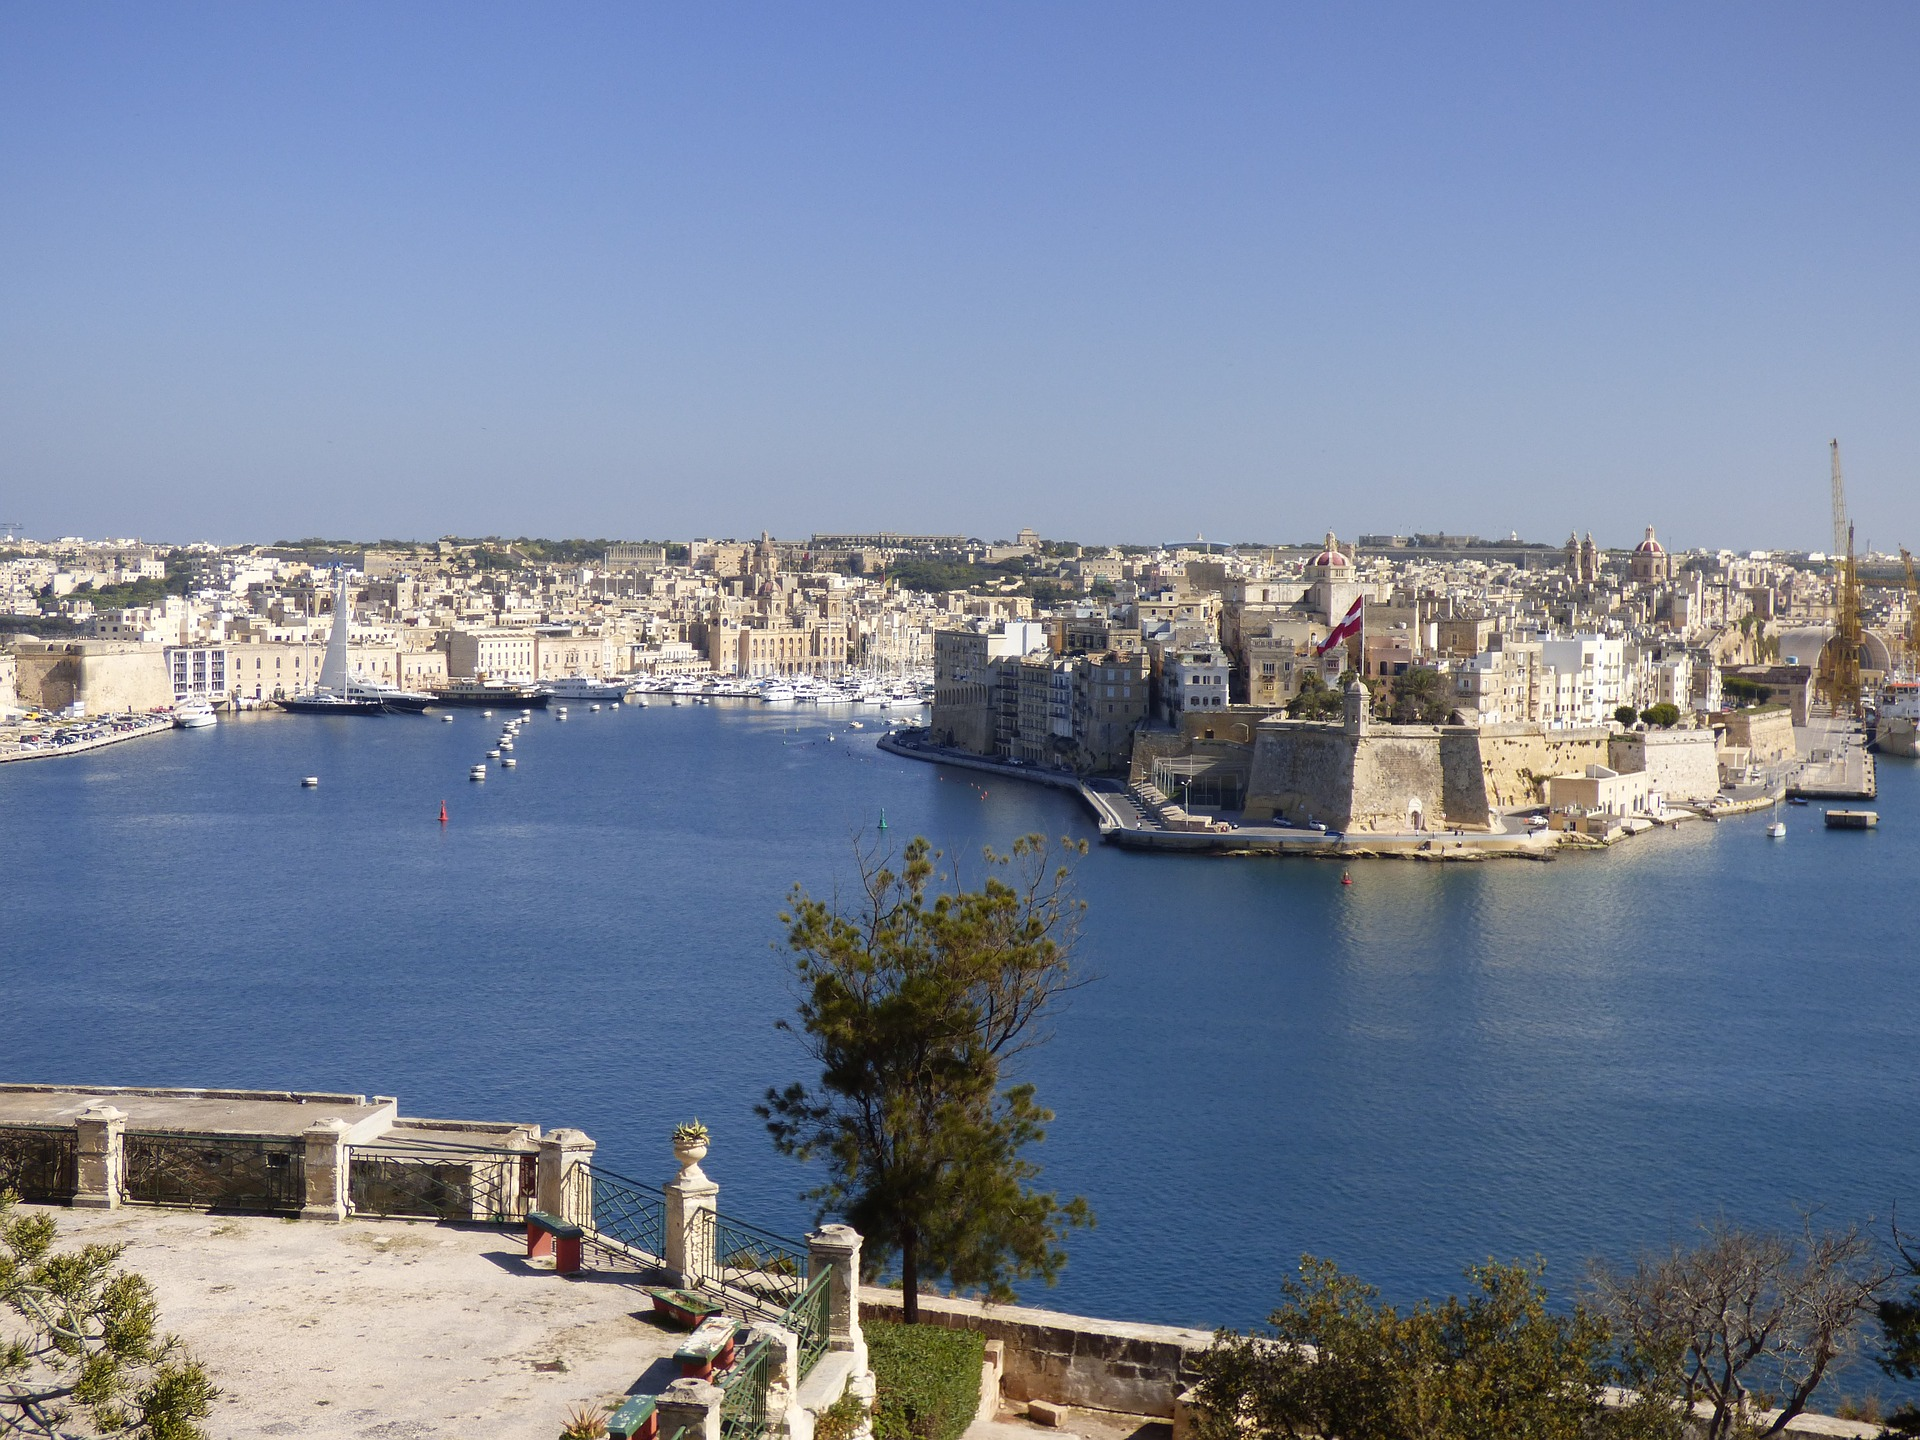 Harbour in Valletta, Malta